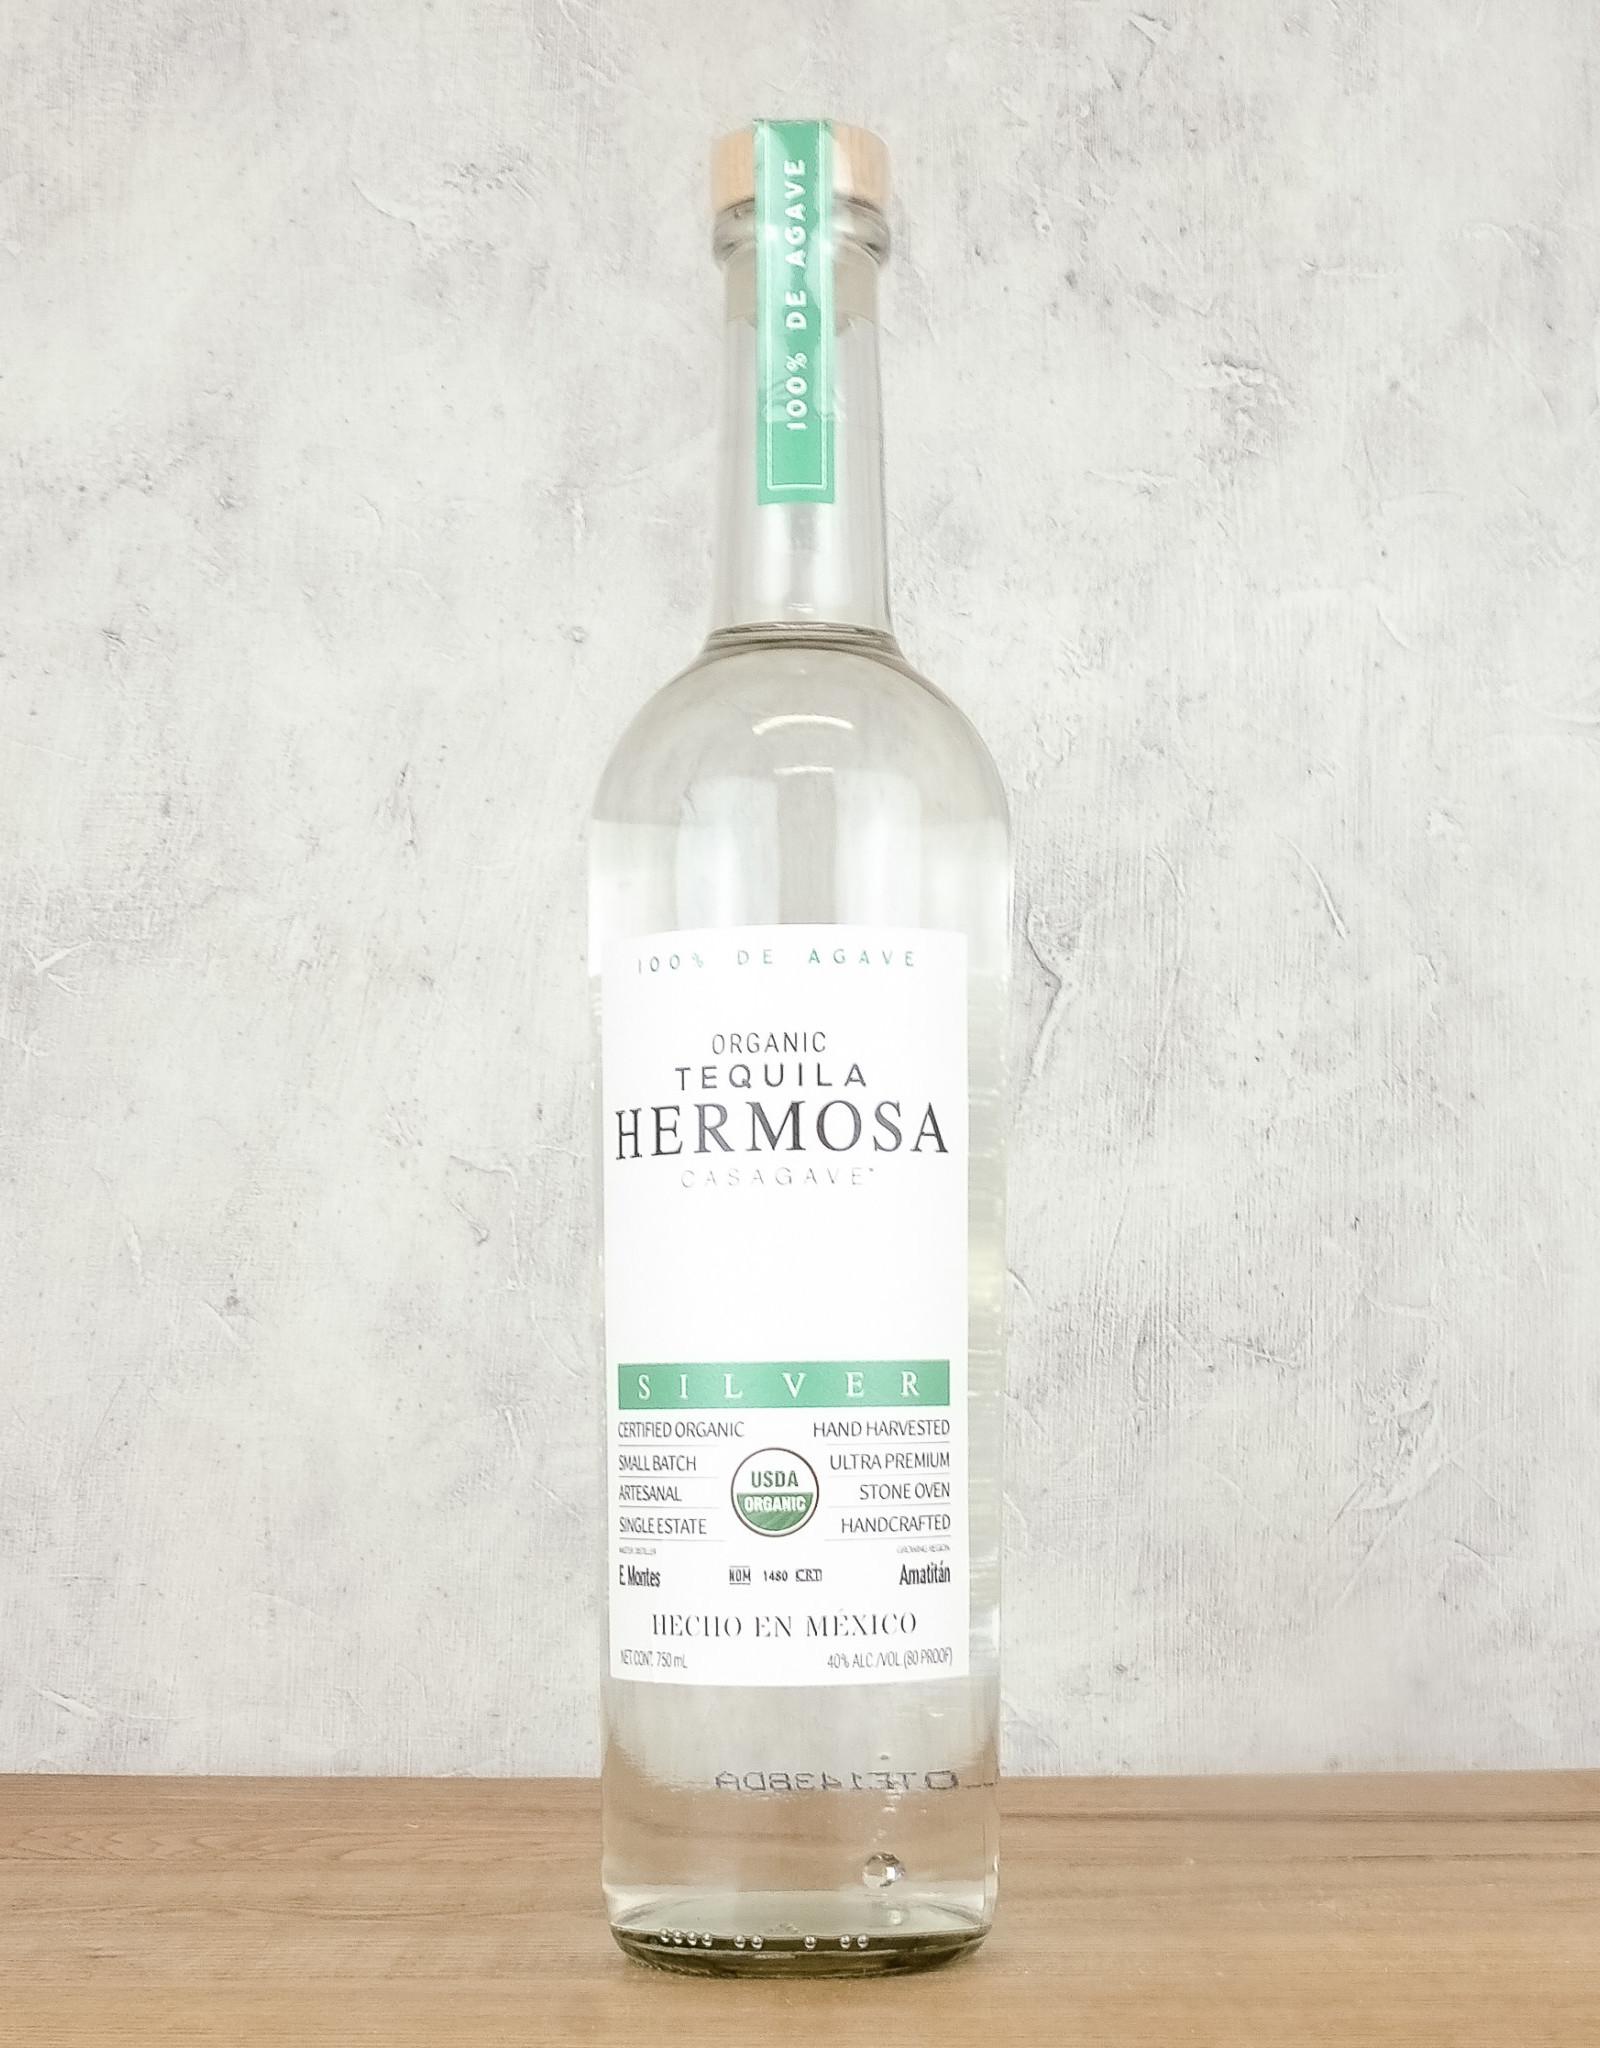 Hermosa Tequila Blanco